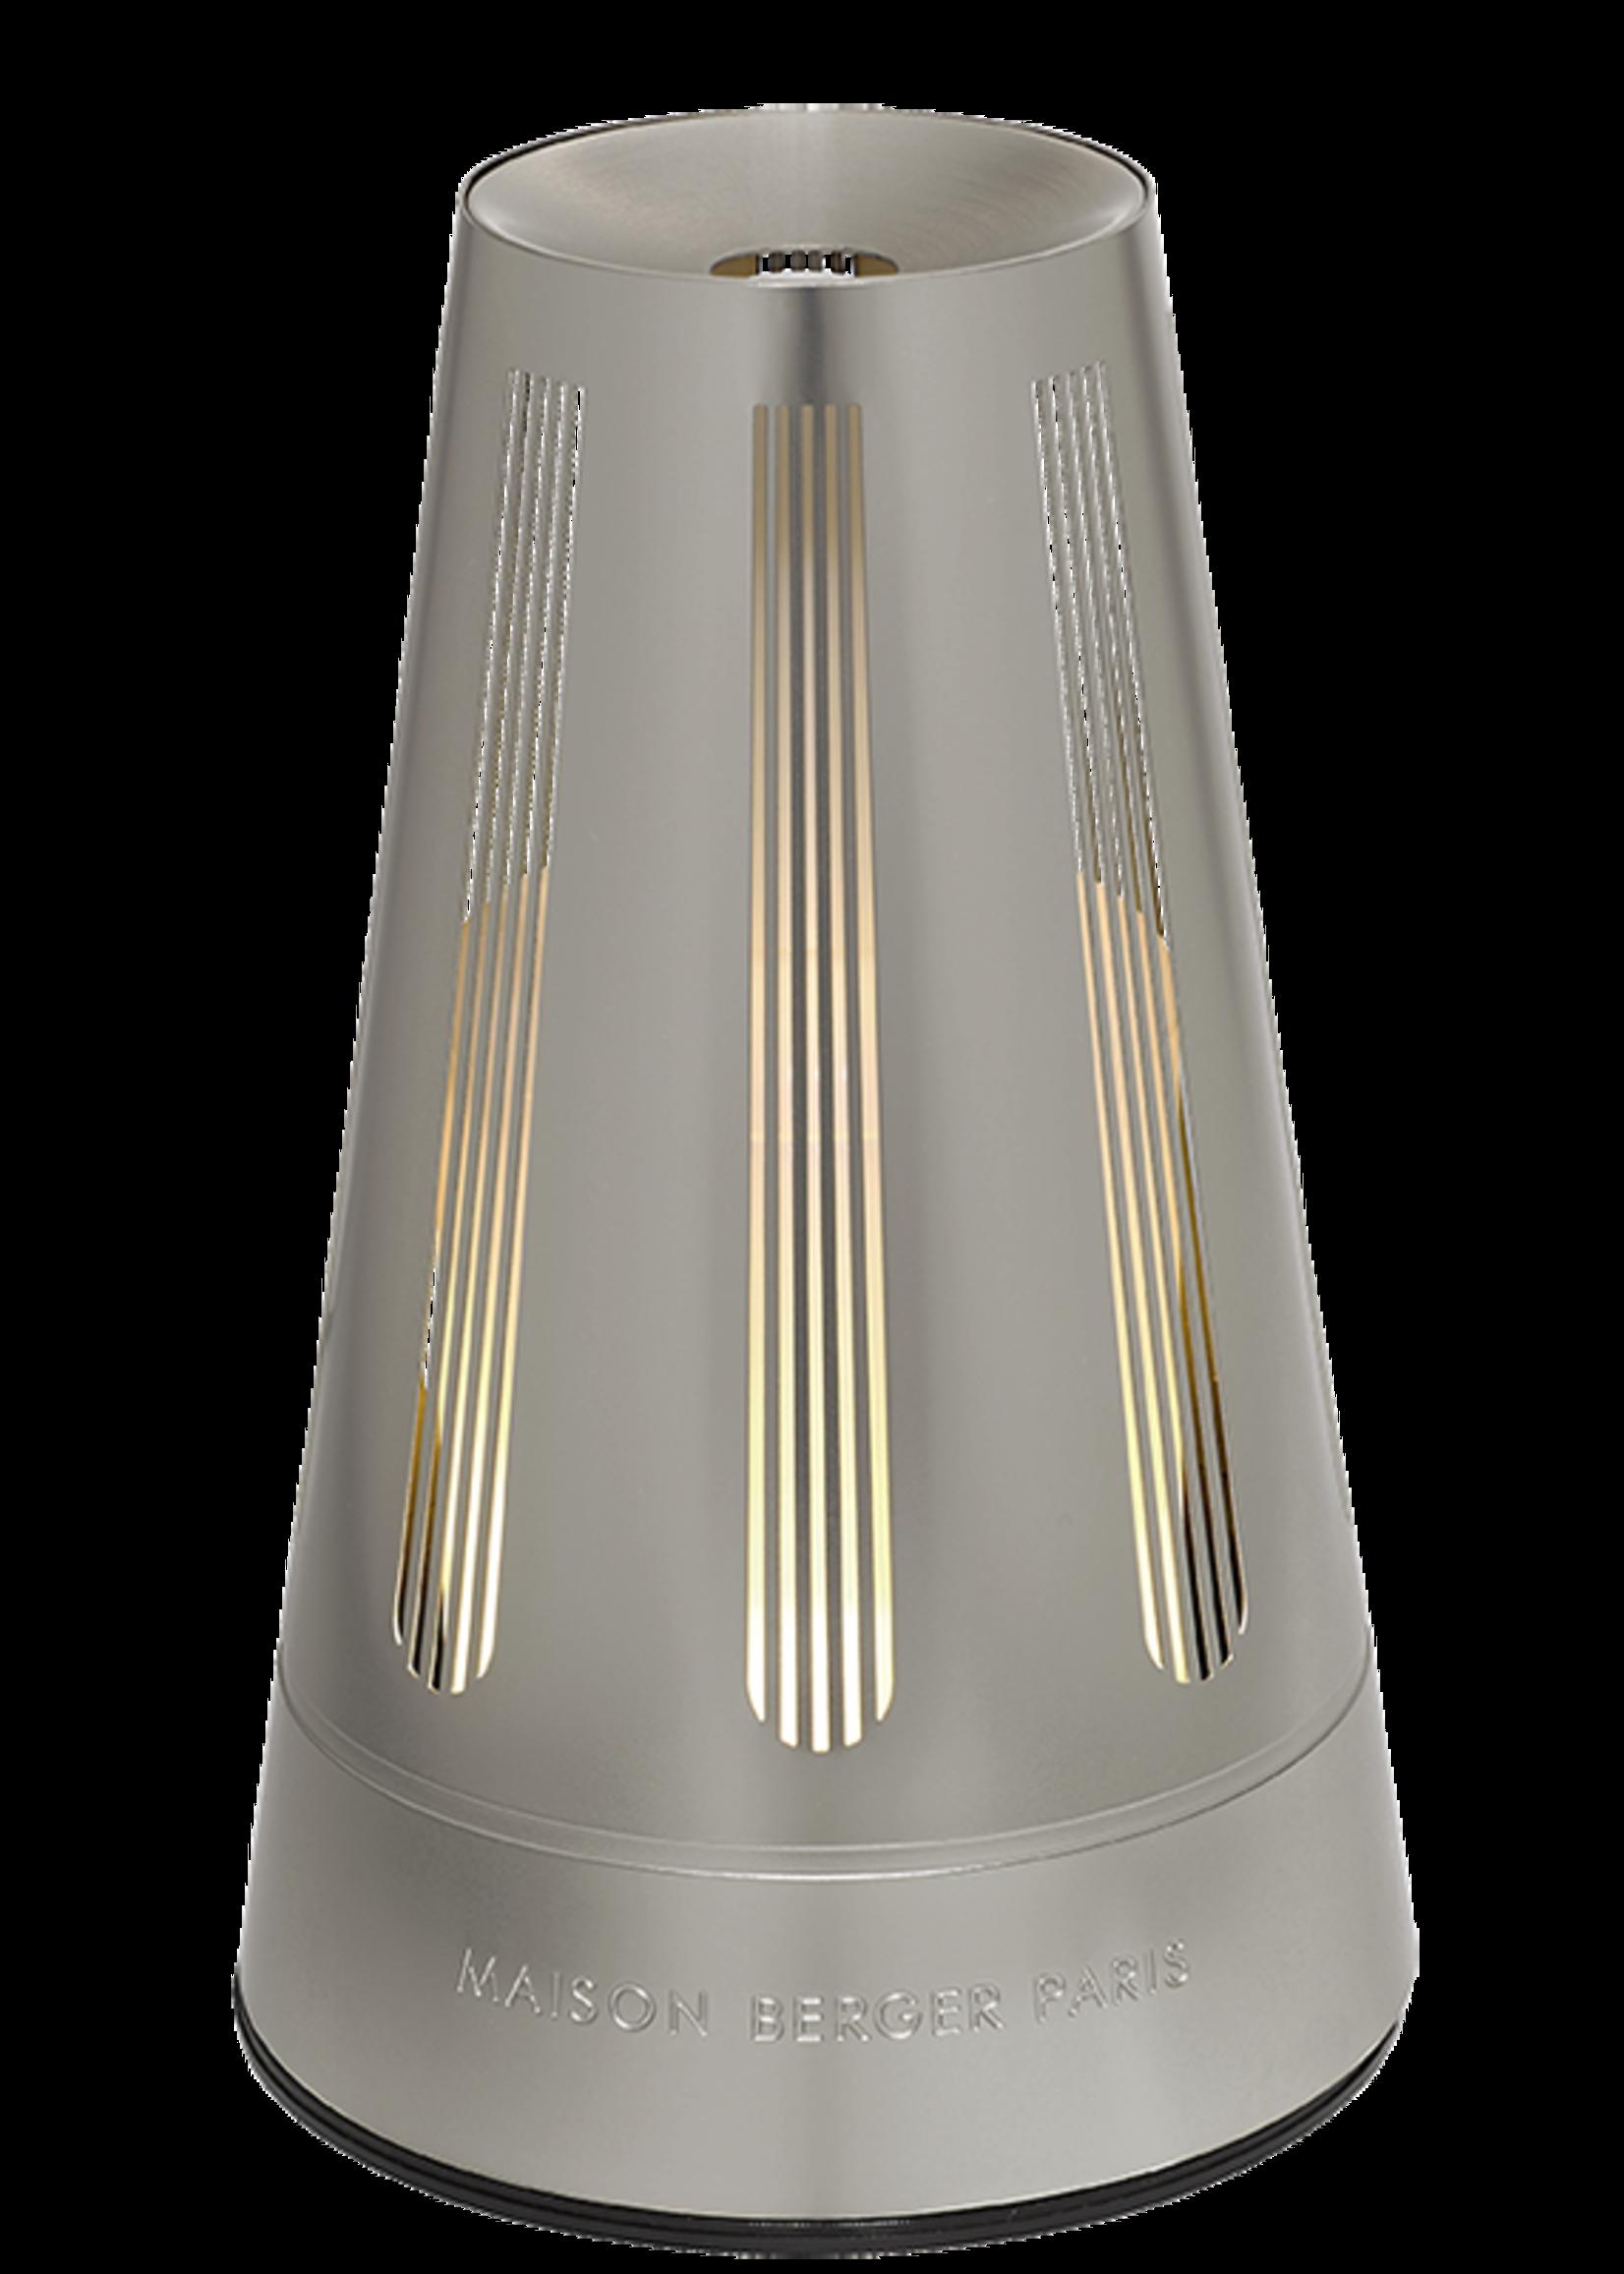 Lampe Berger Mist Diffuser Amphora